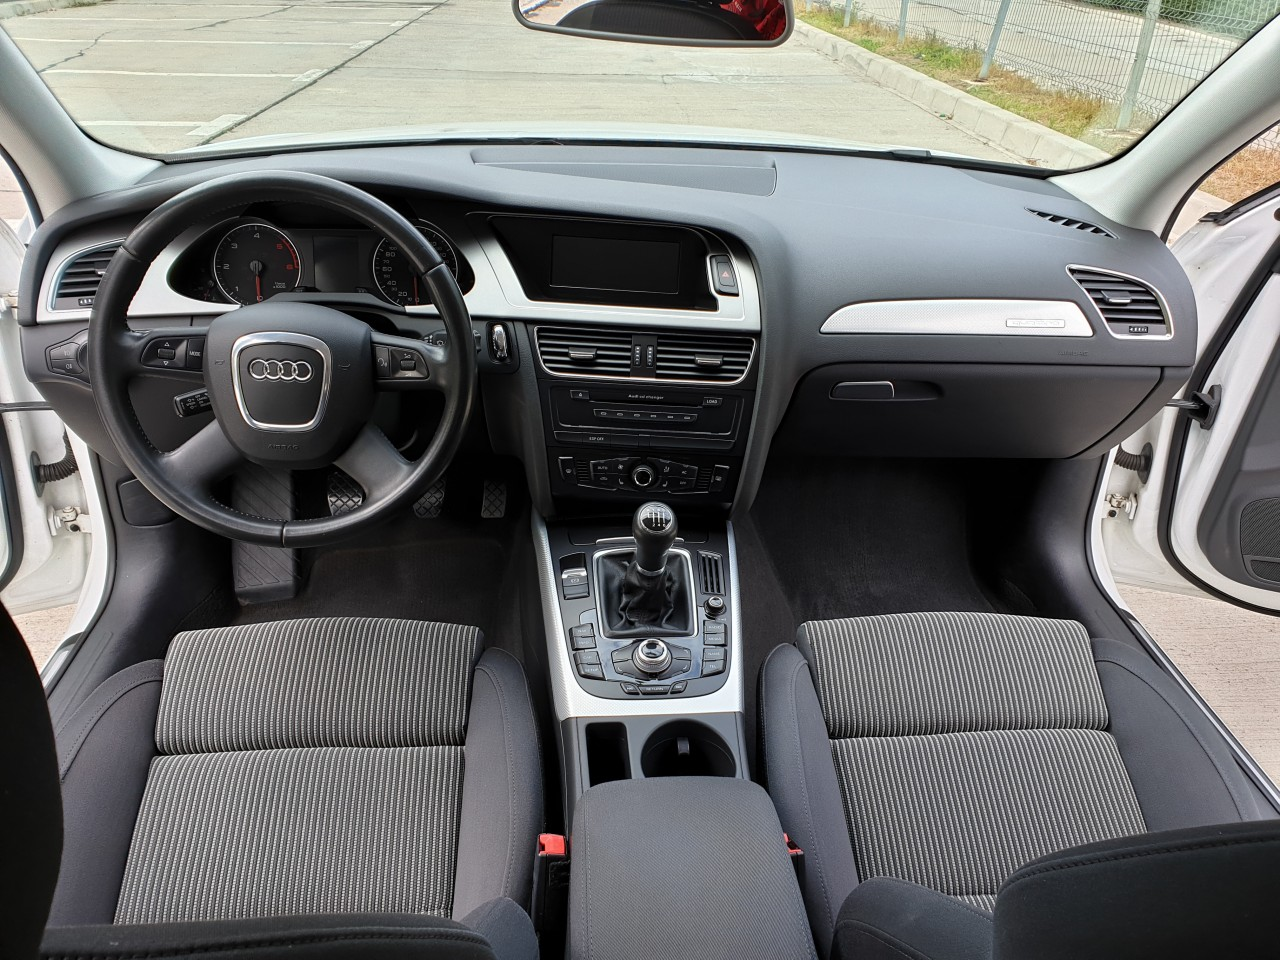 Audi A4 s-line quattro (4x4) fab.2009, 2.0 TDI fab. 2009